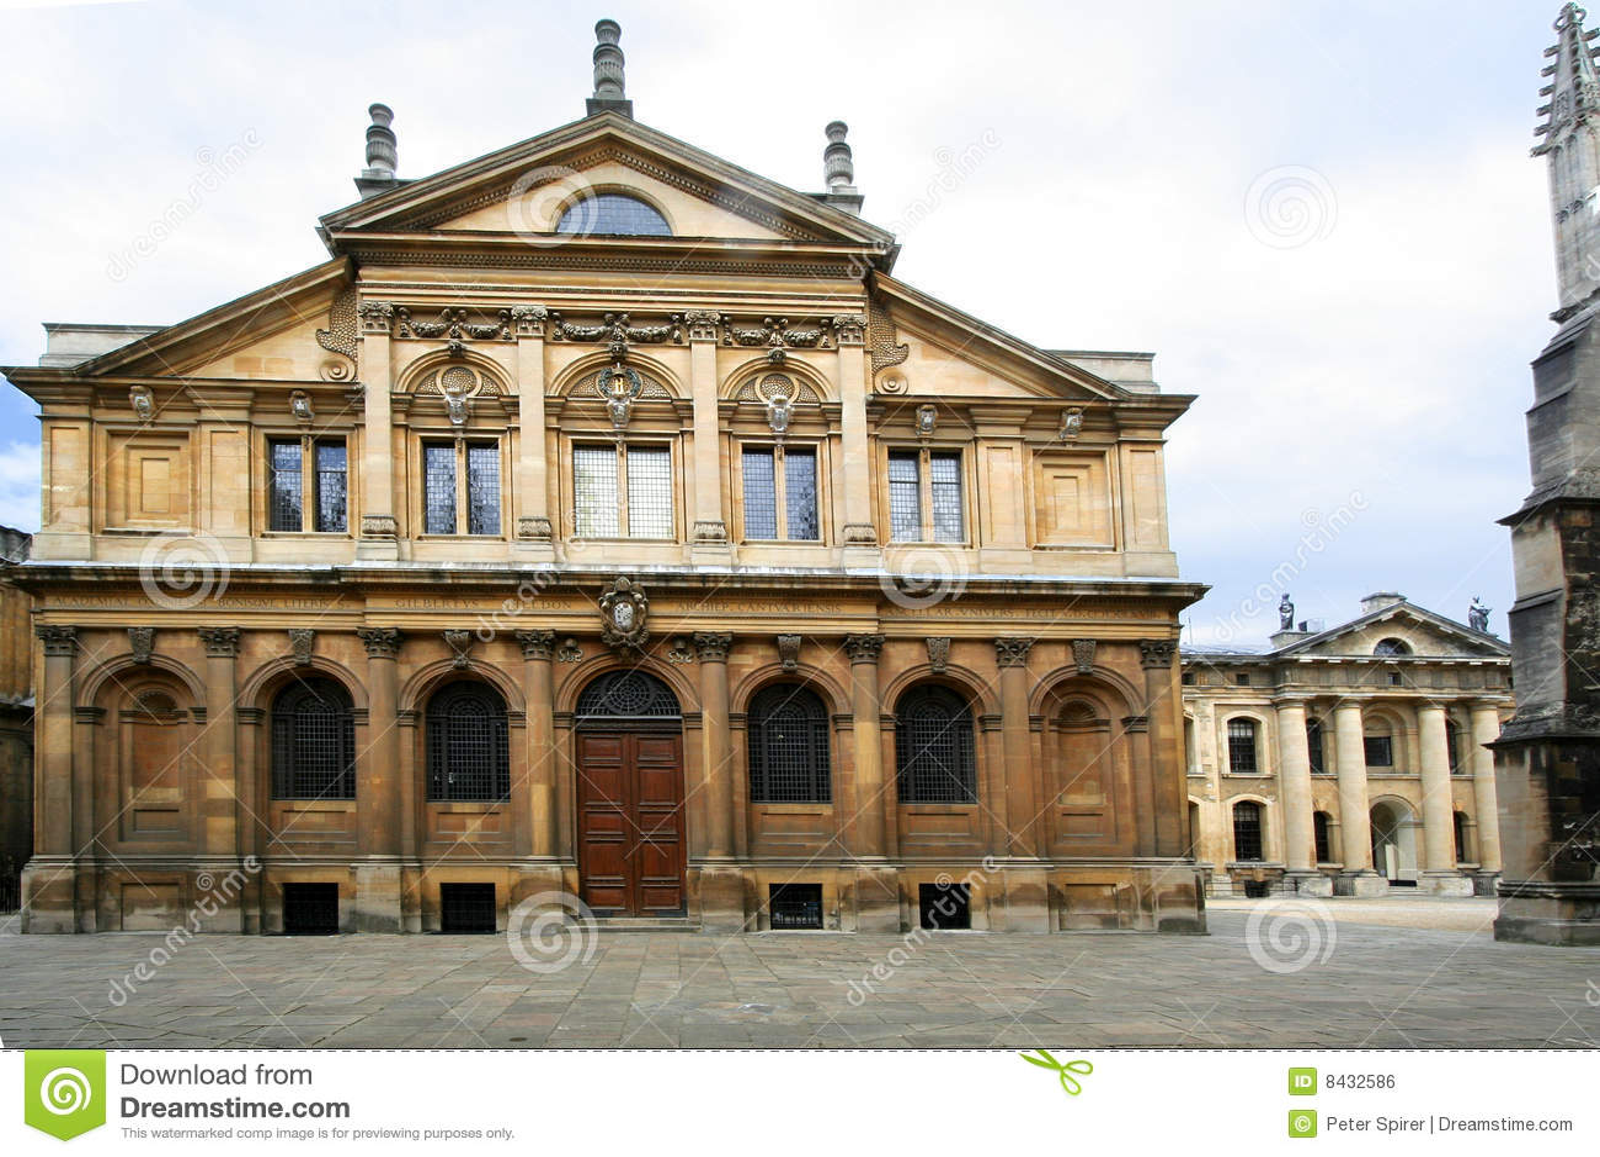 Oxford University, Sheldonian Theatre